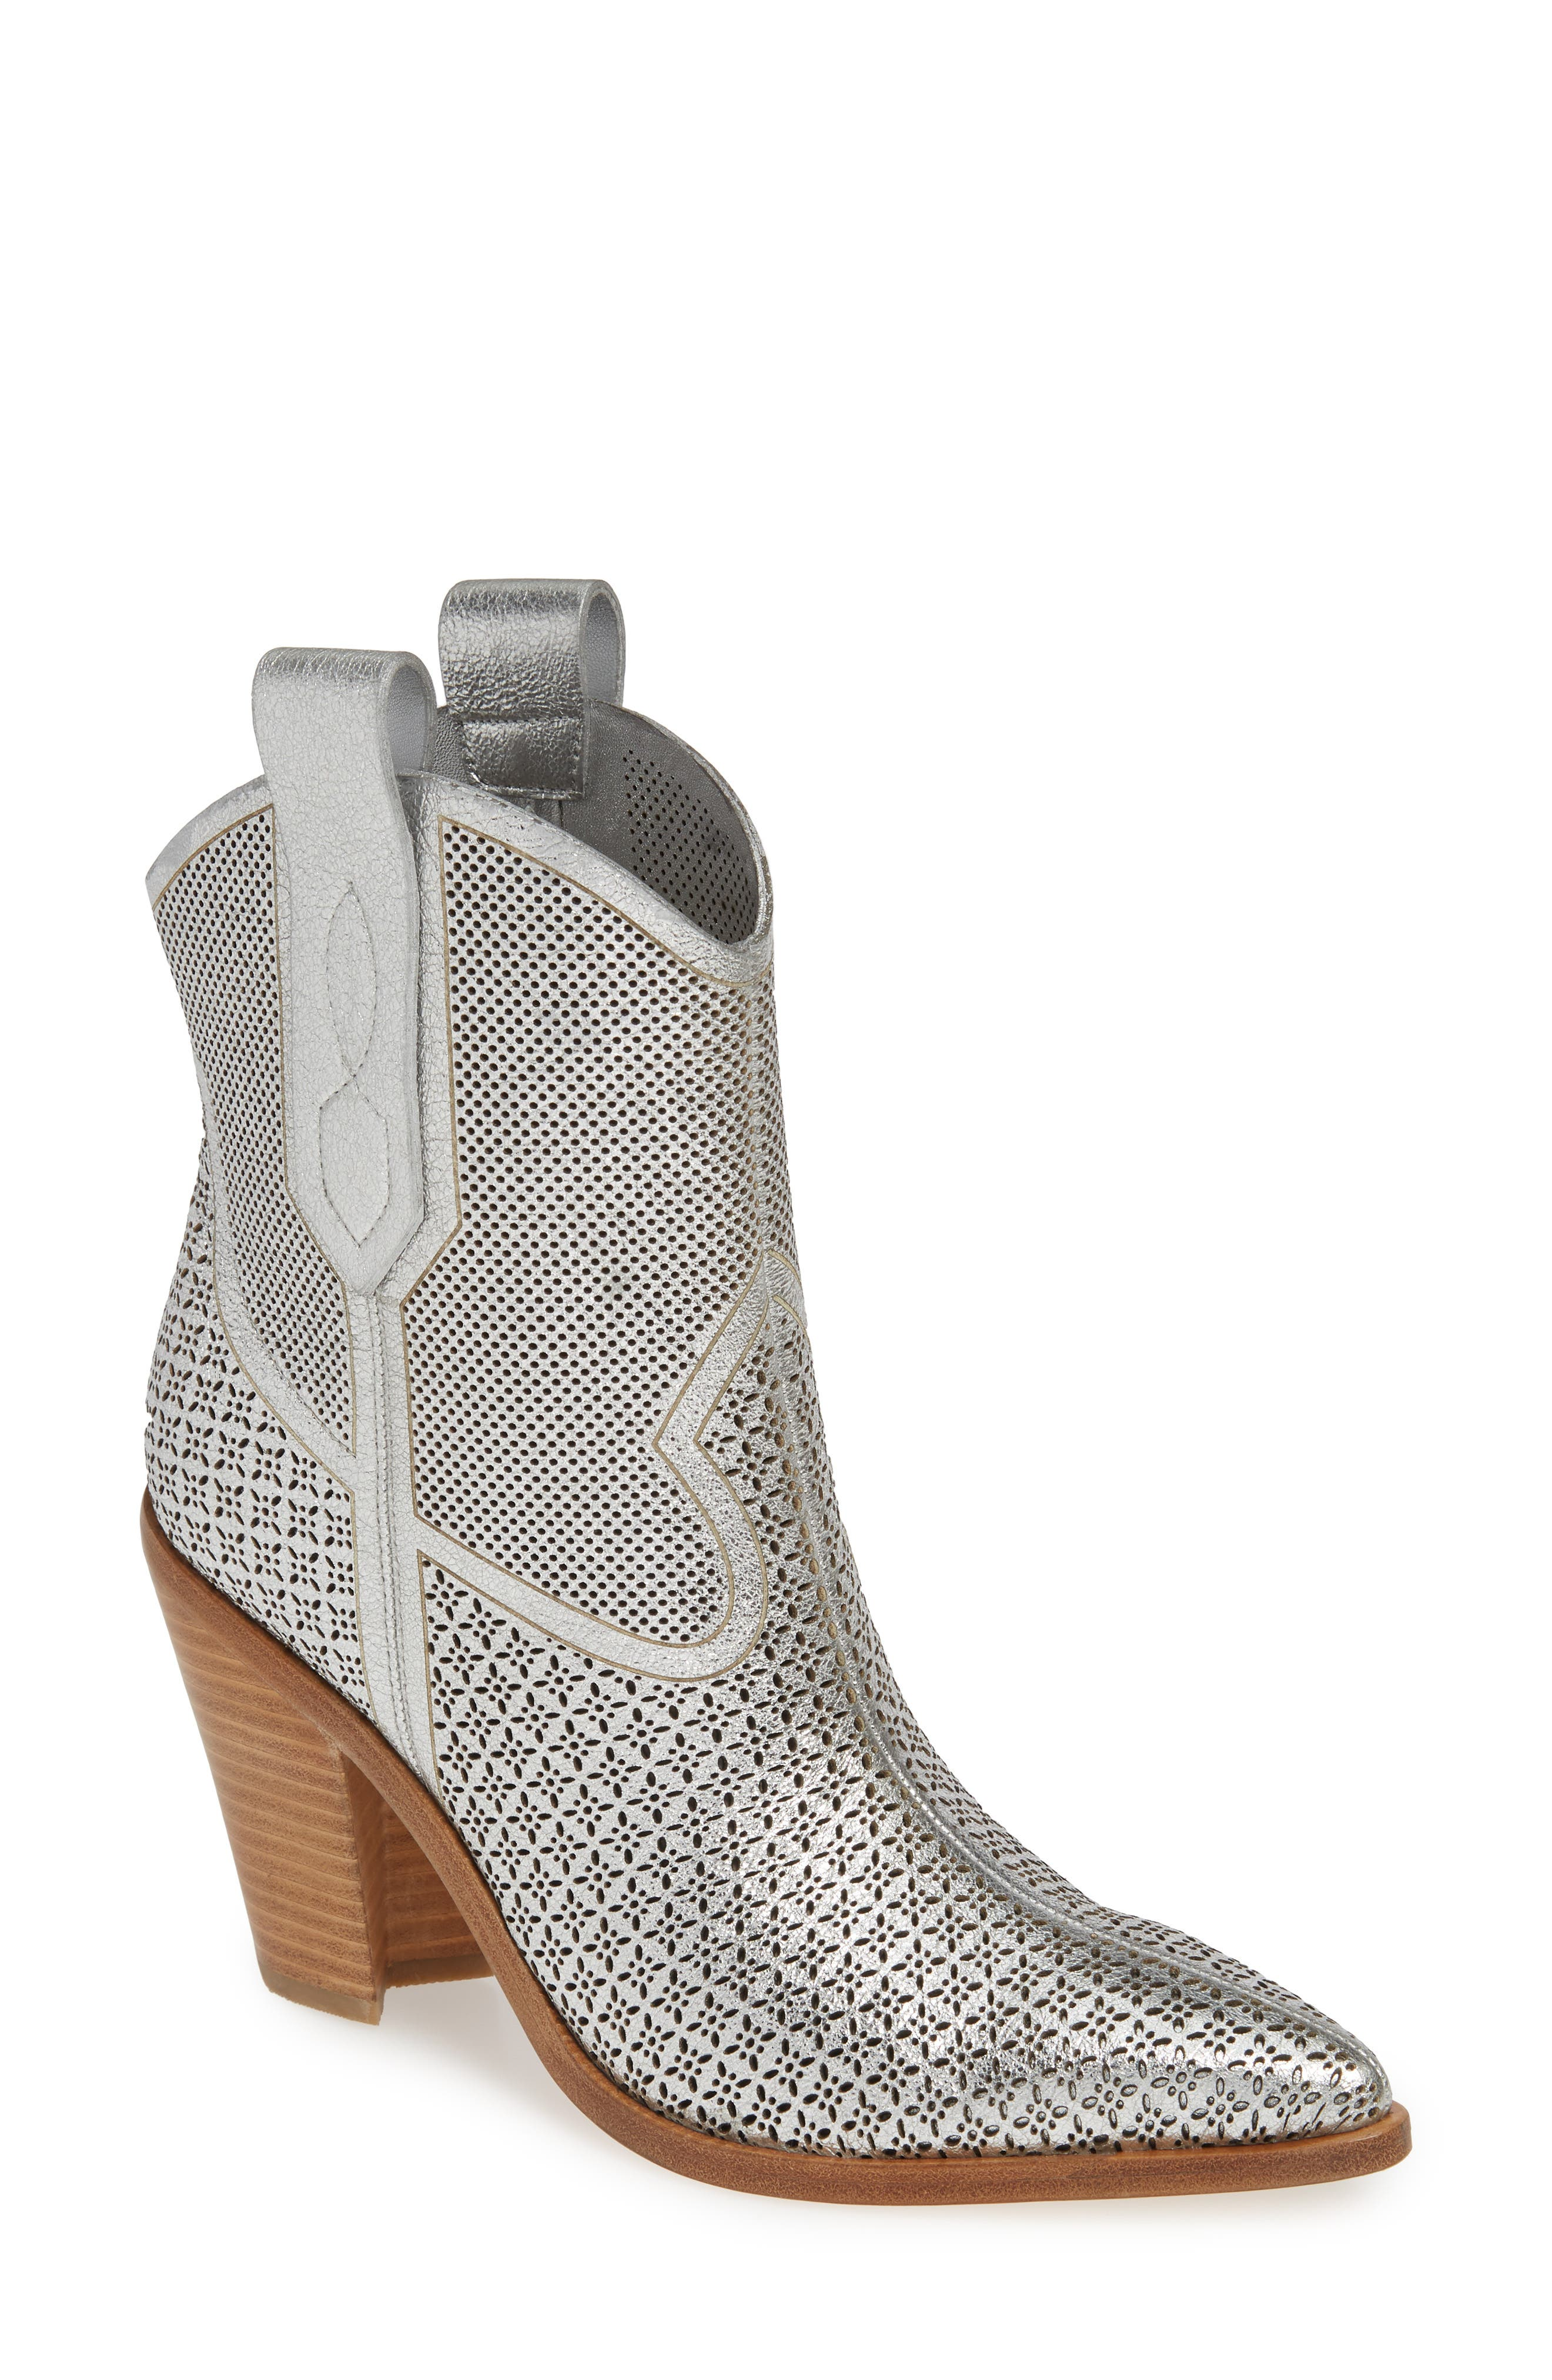 Sigerson Morrison Western Boot Metallic